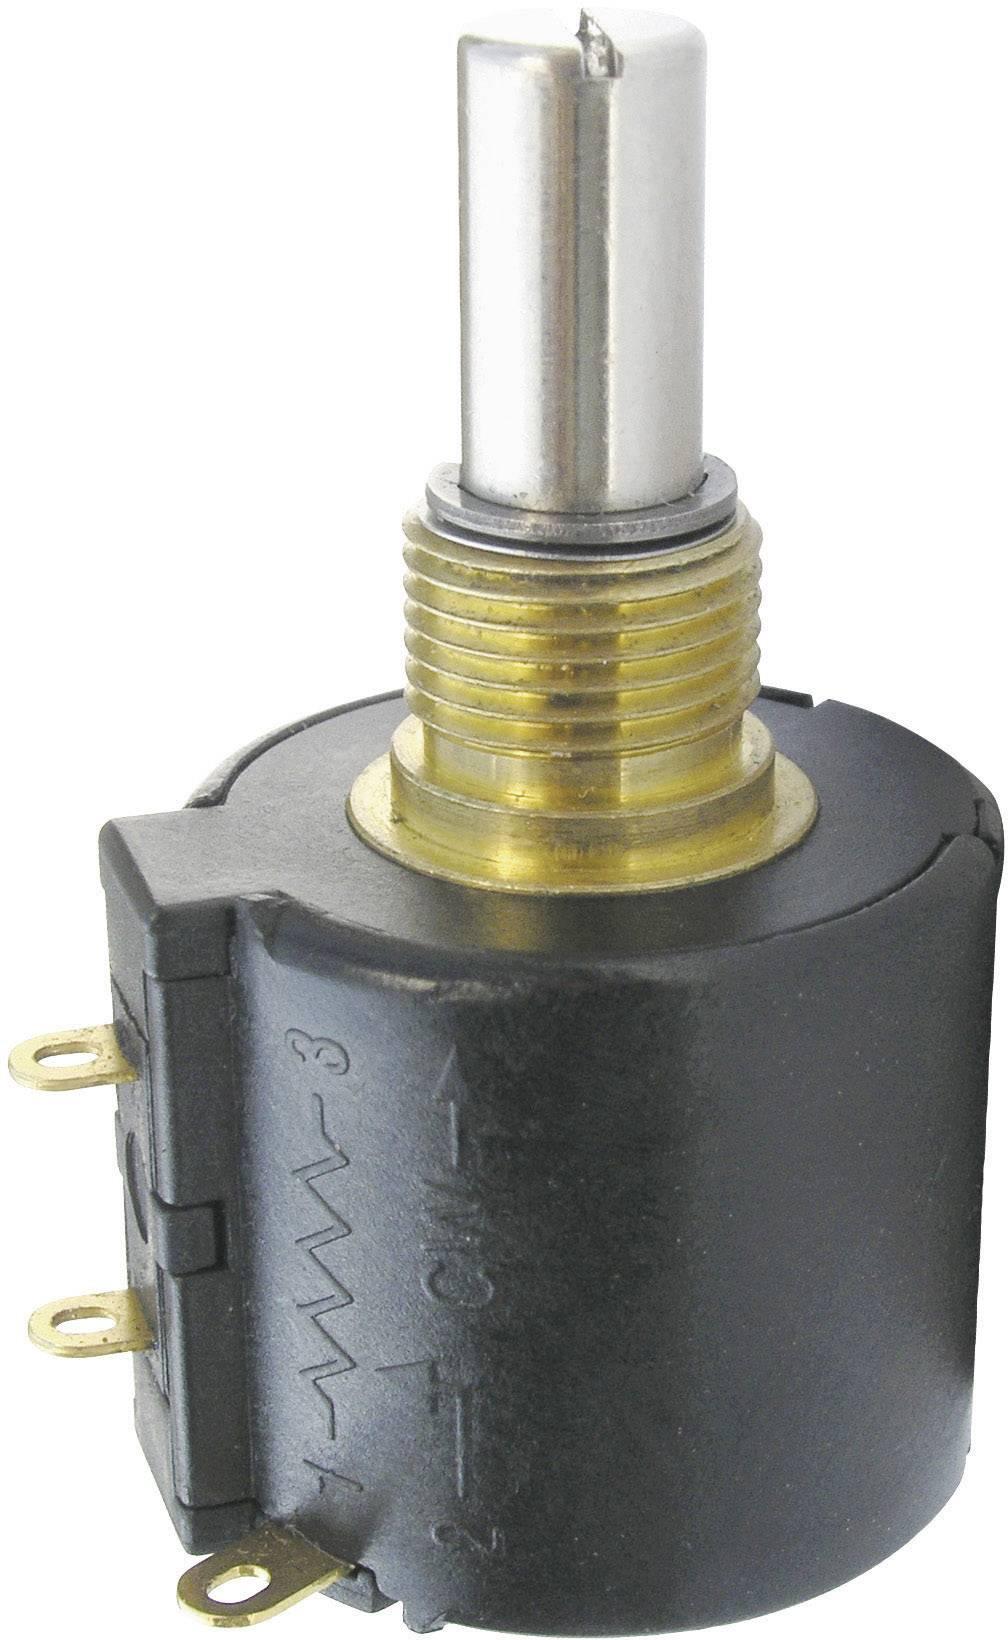 Presný potenciometer 3-cestný mono Bourns 3547S-1AA-102A 3547S-1AA-102A, 1 W, 1 kOhm, 1 ks